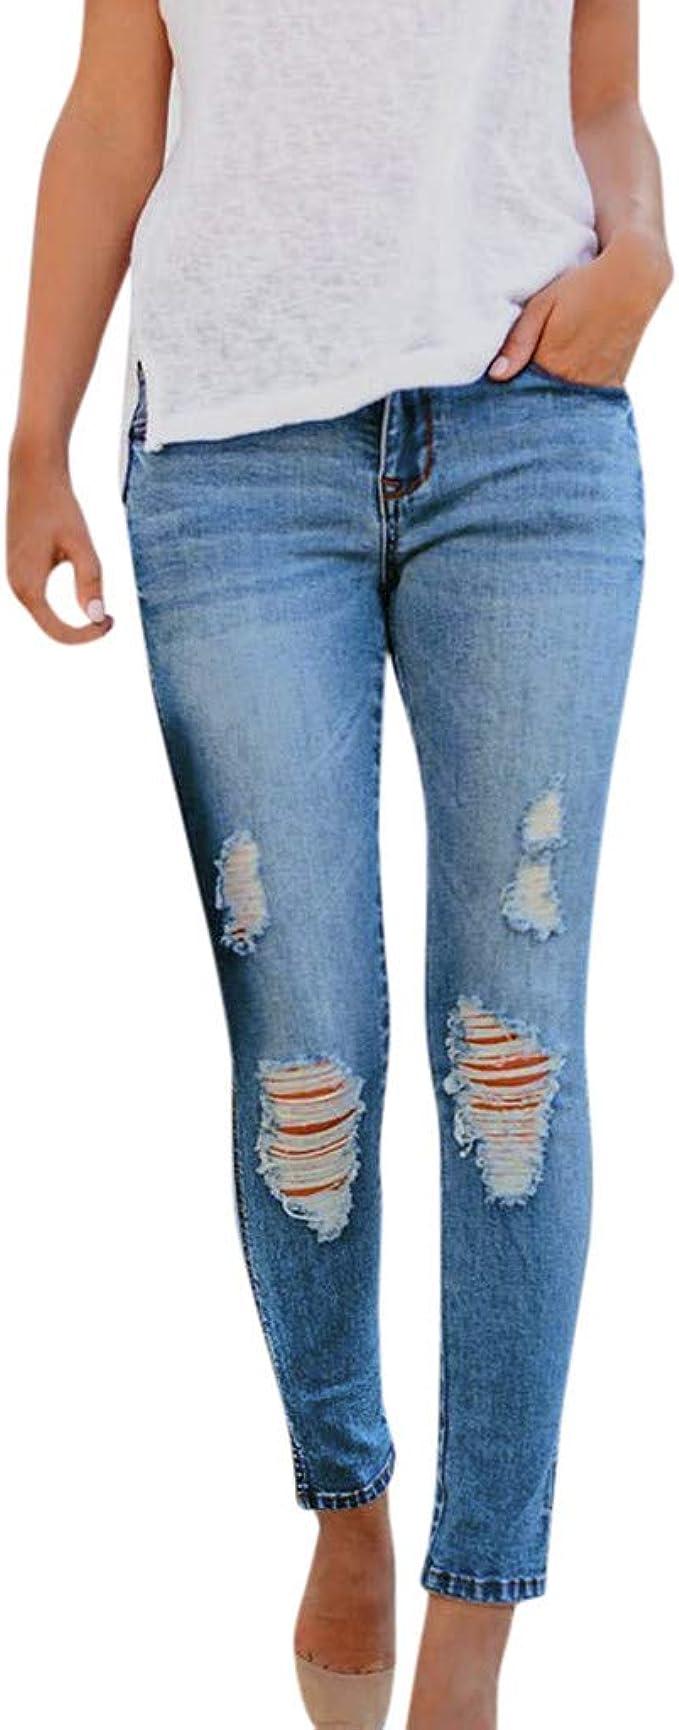 Damen High Waist Jeanshose Skinny Röhrenjeans Hose Stretch Trousers Jeans Slim